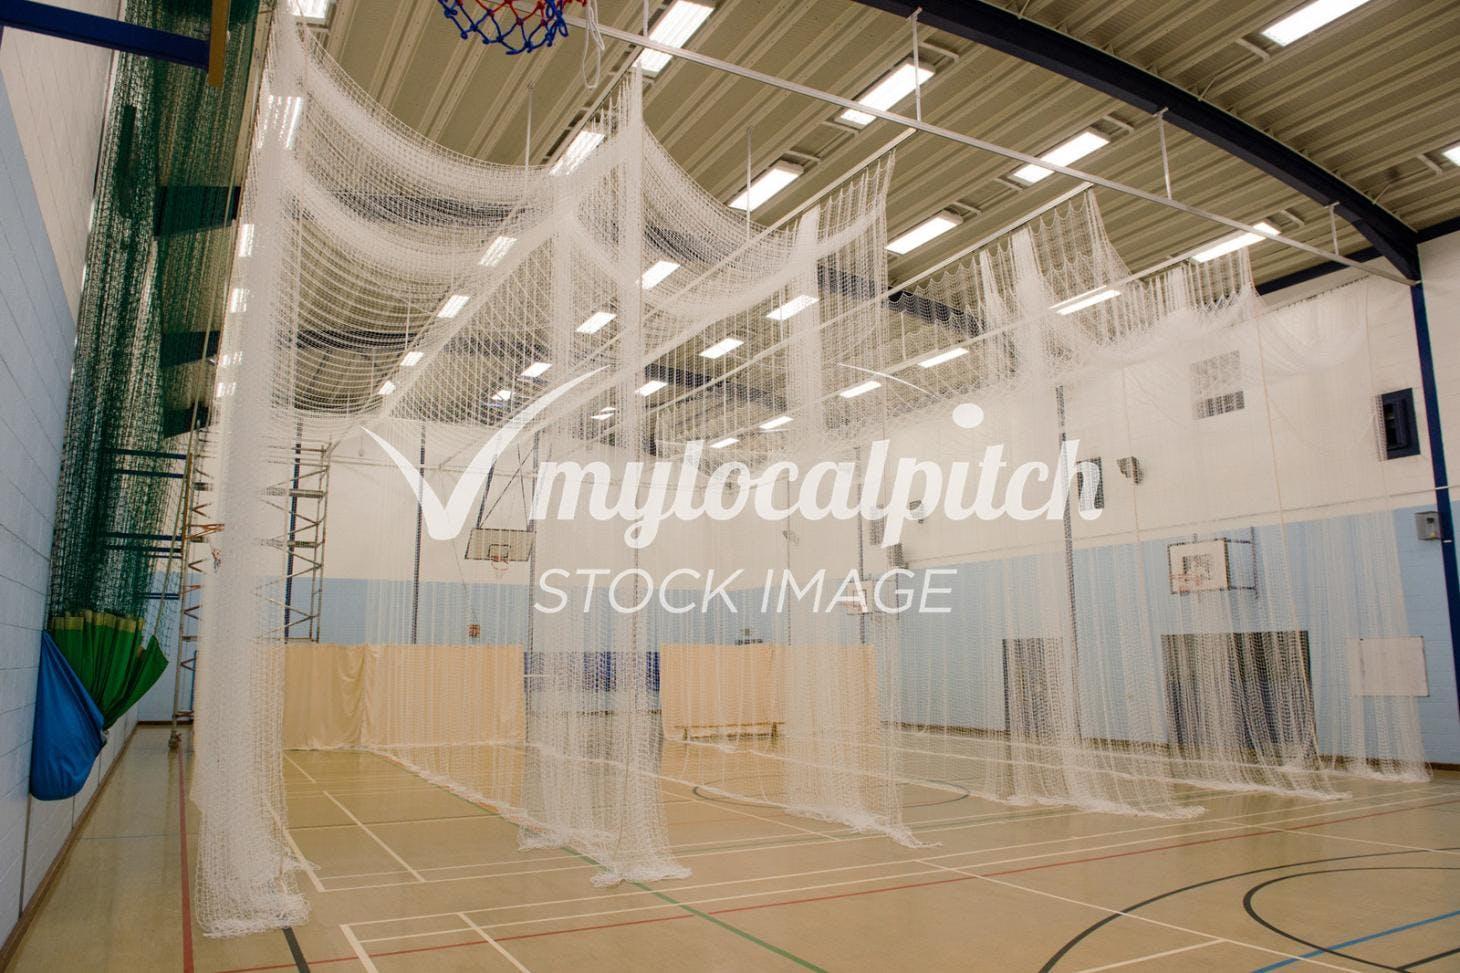 Challney High School for Boys Nets   Sports hall cricket facilities